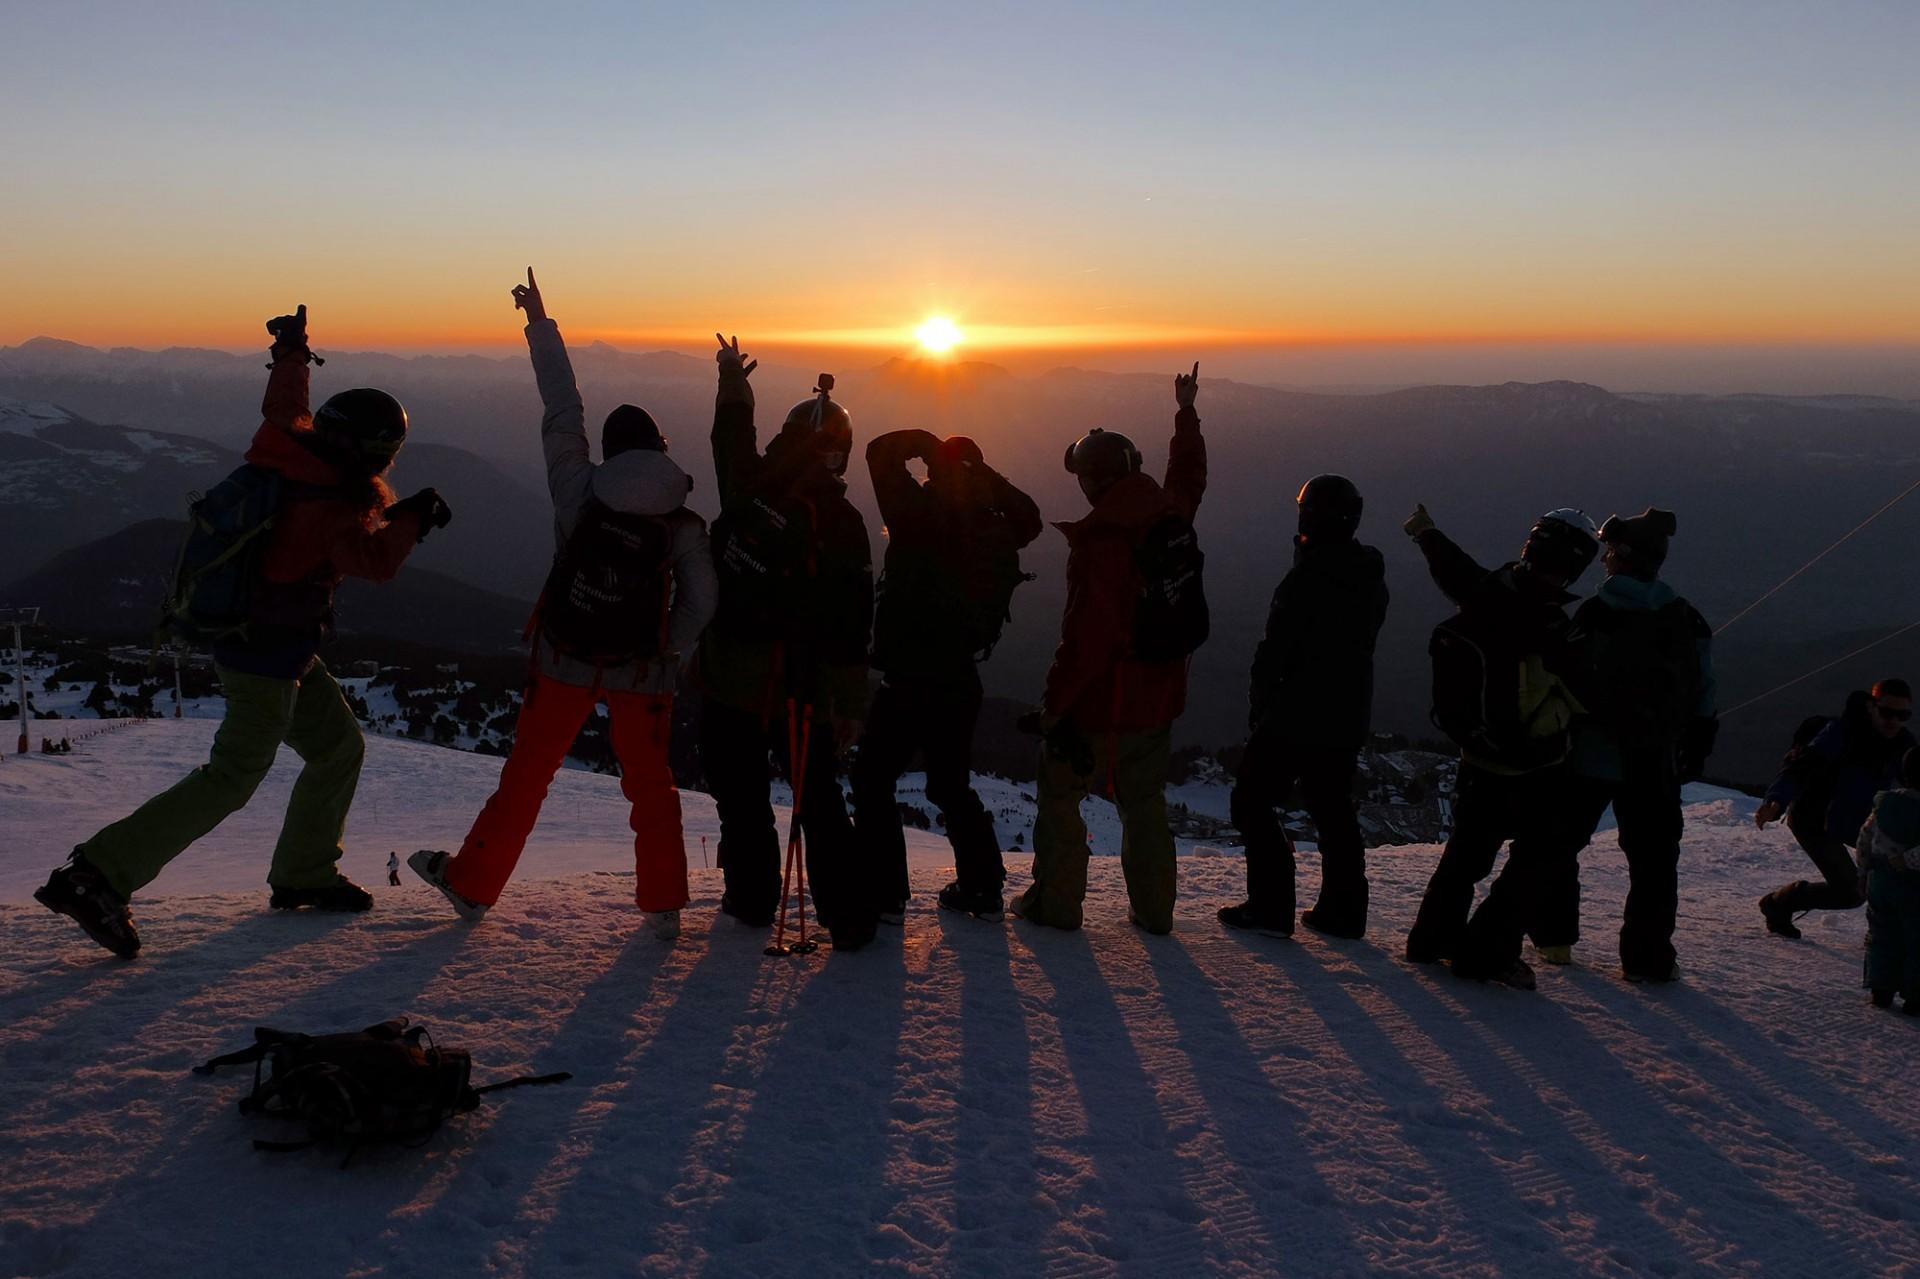 Chamrousse ski nocturne station ski hiver isère alpes france